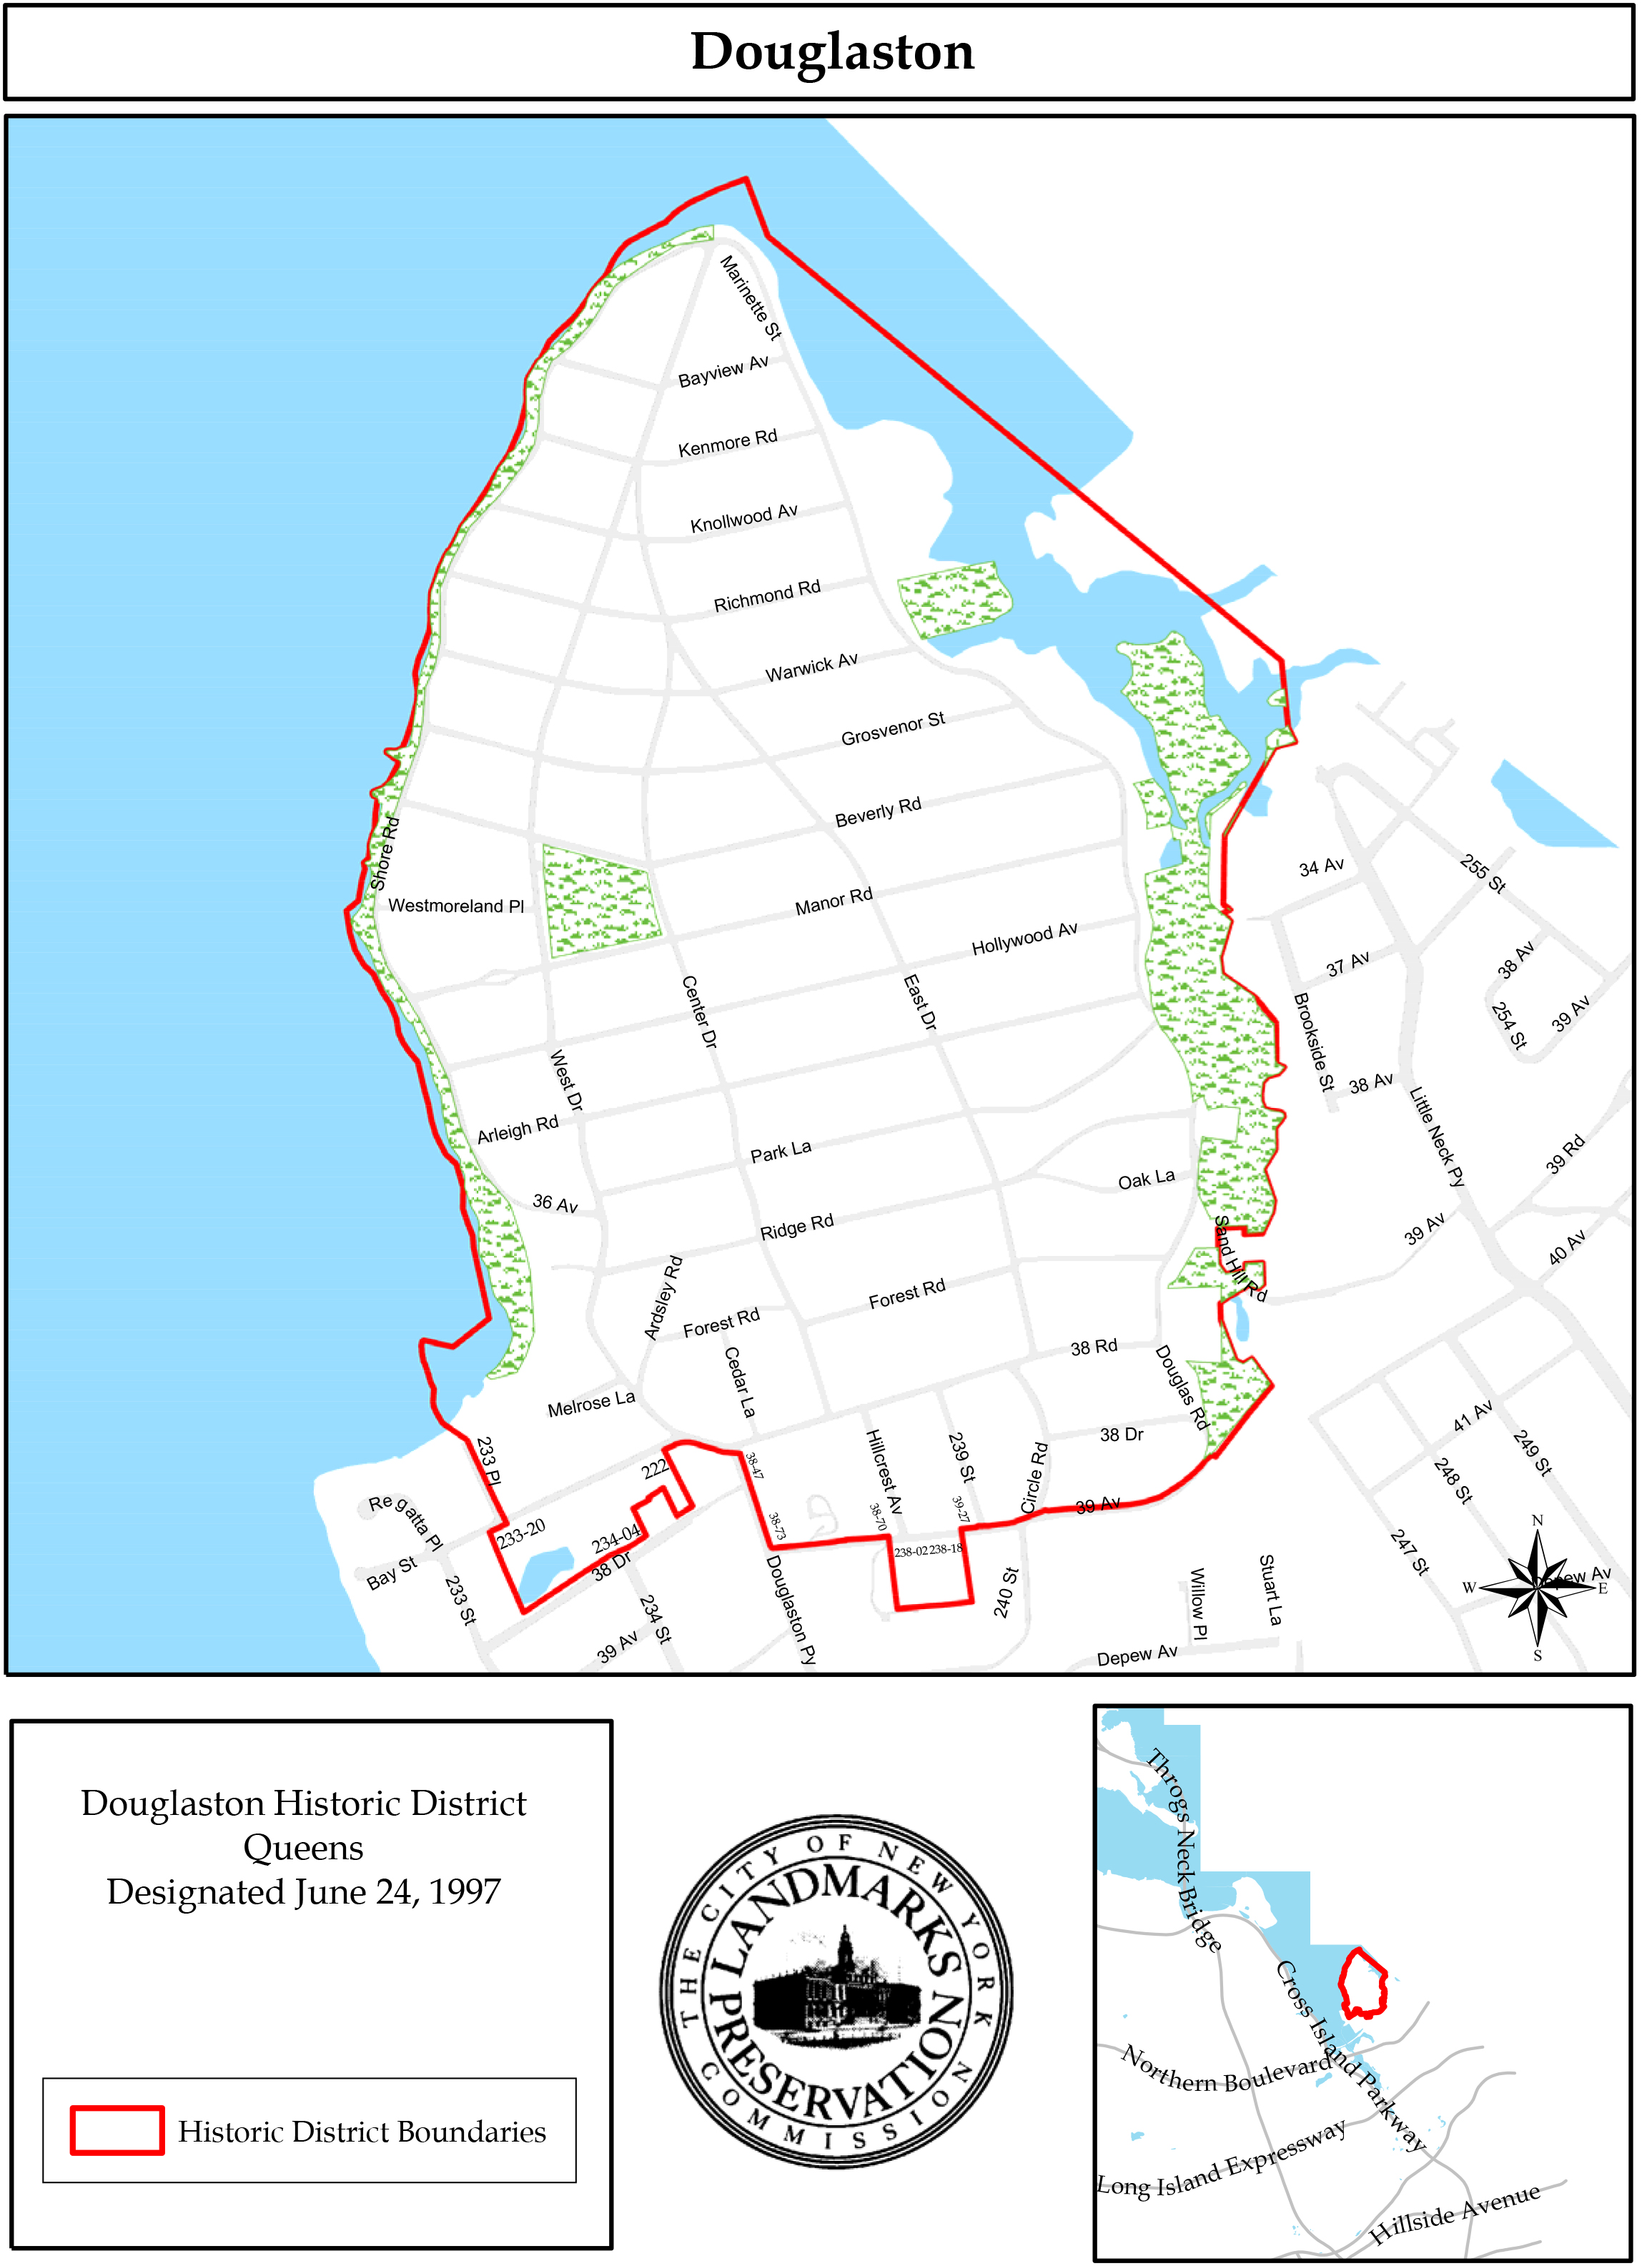 Map of the Douglaston Historic District